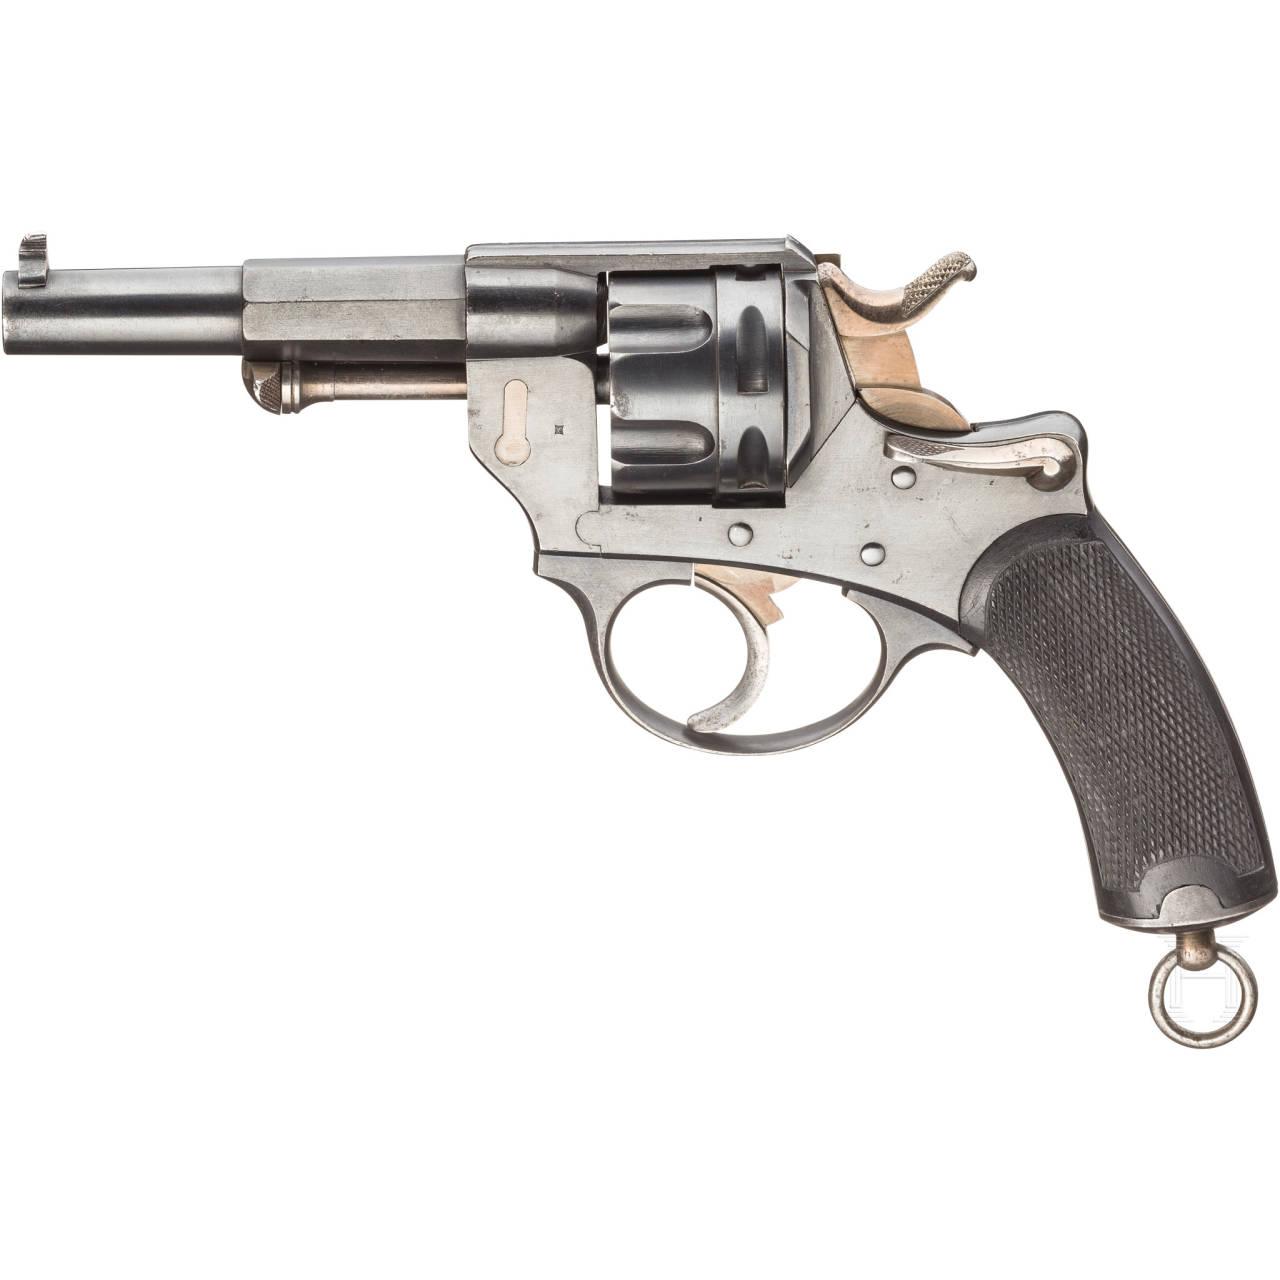 Offiziersrevolver Mod. 1874, Commercial, Versuch (?)